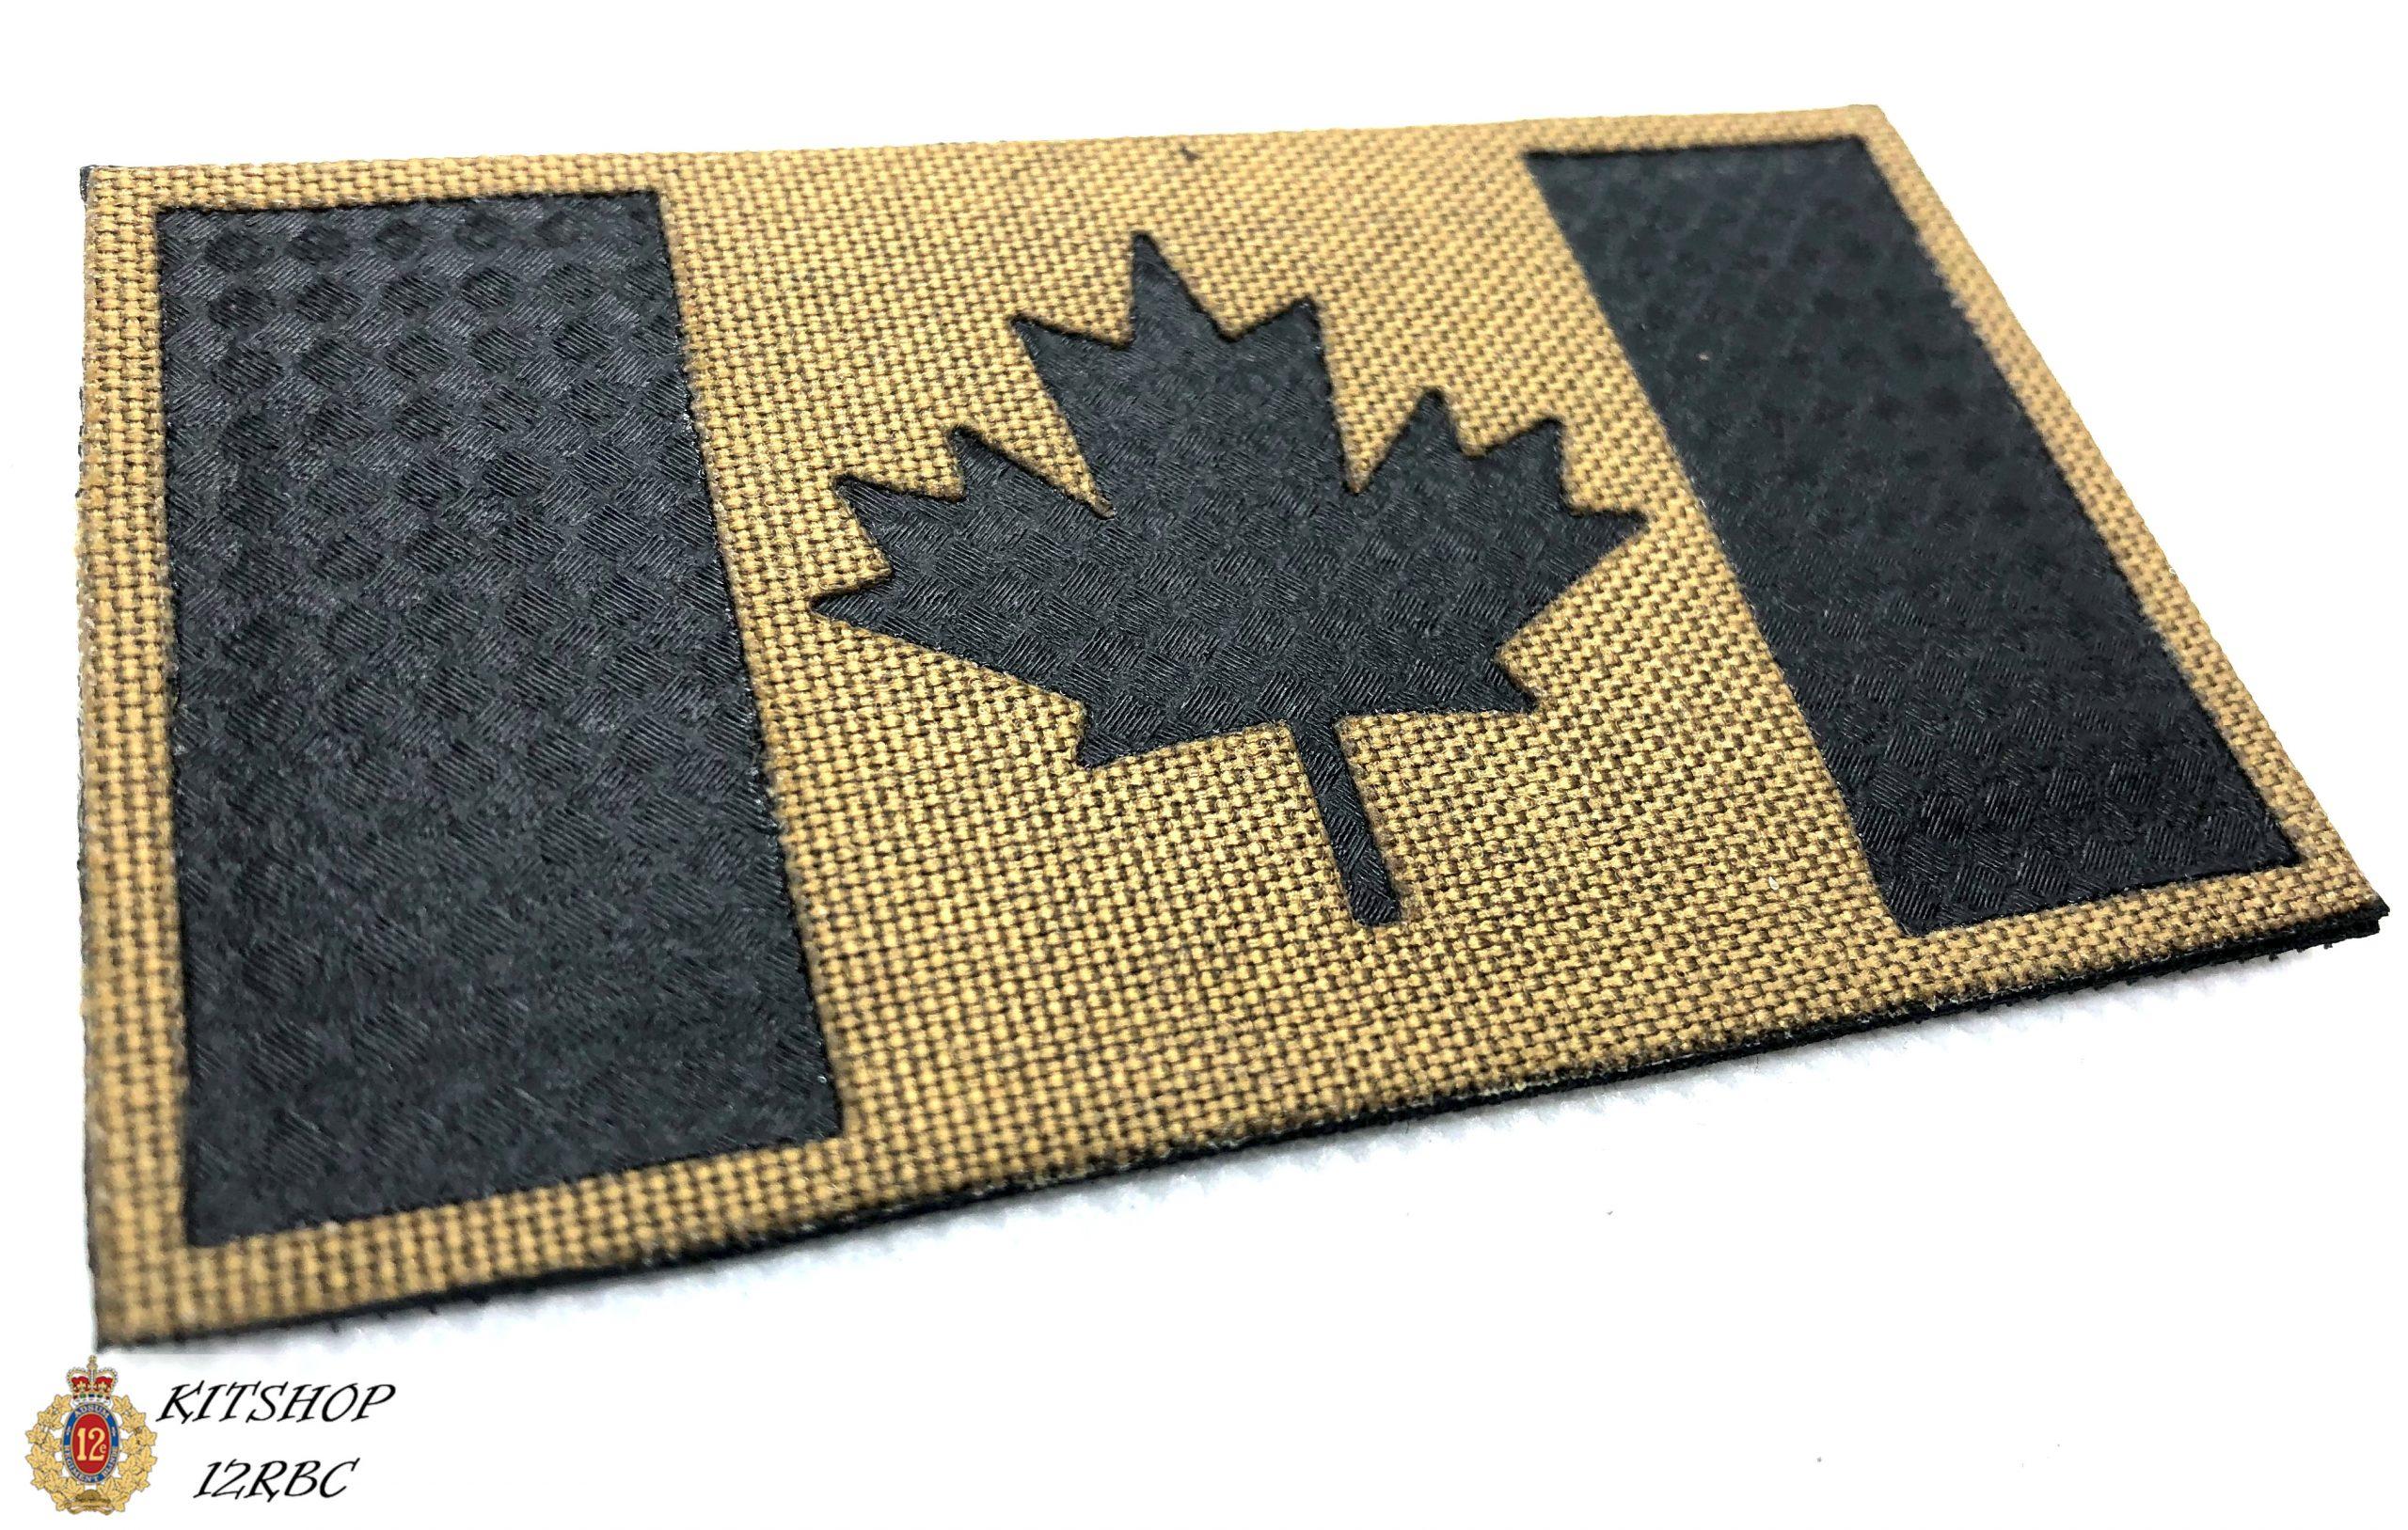 CANADA LASER ENGRAVED – TAN